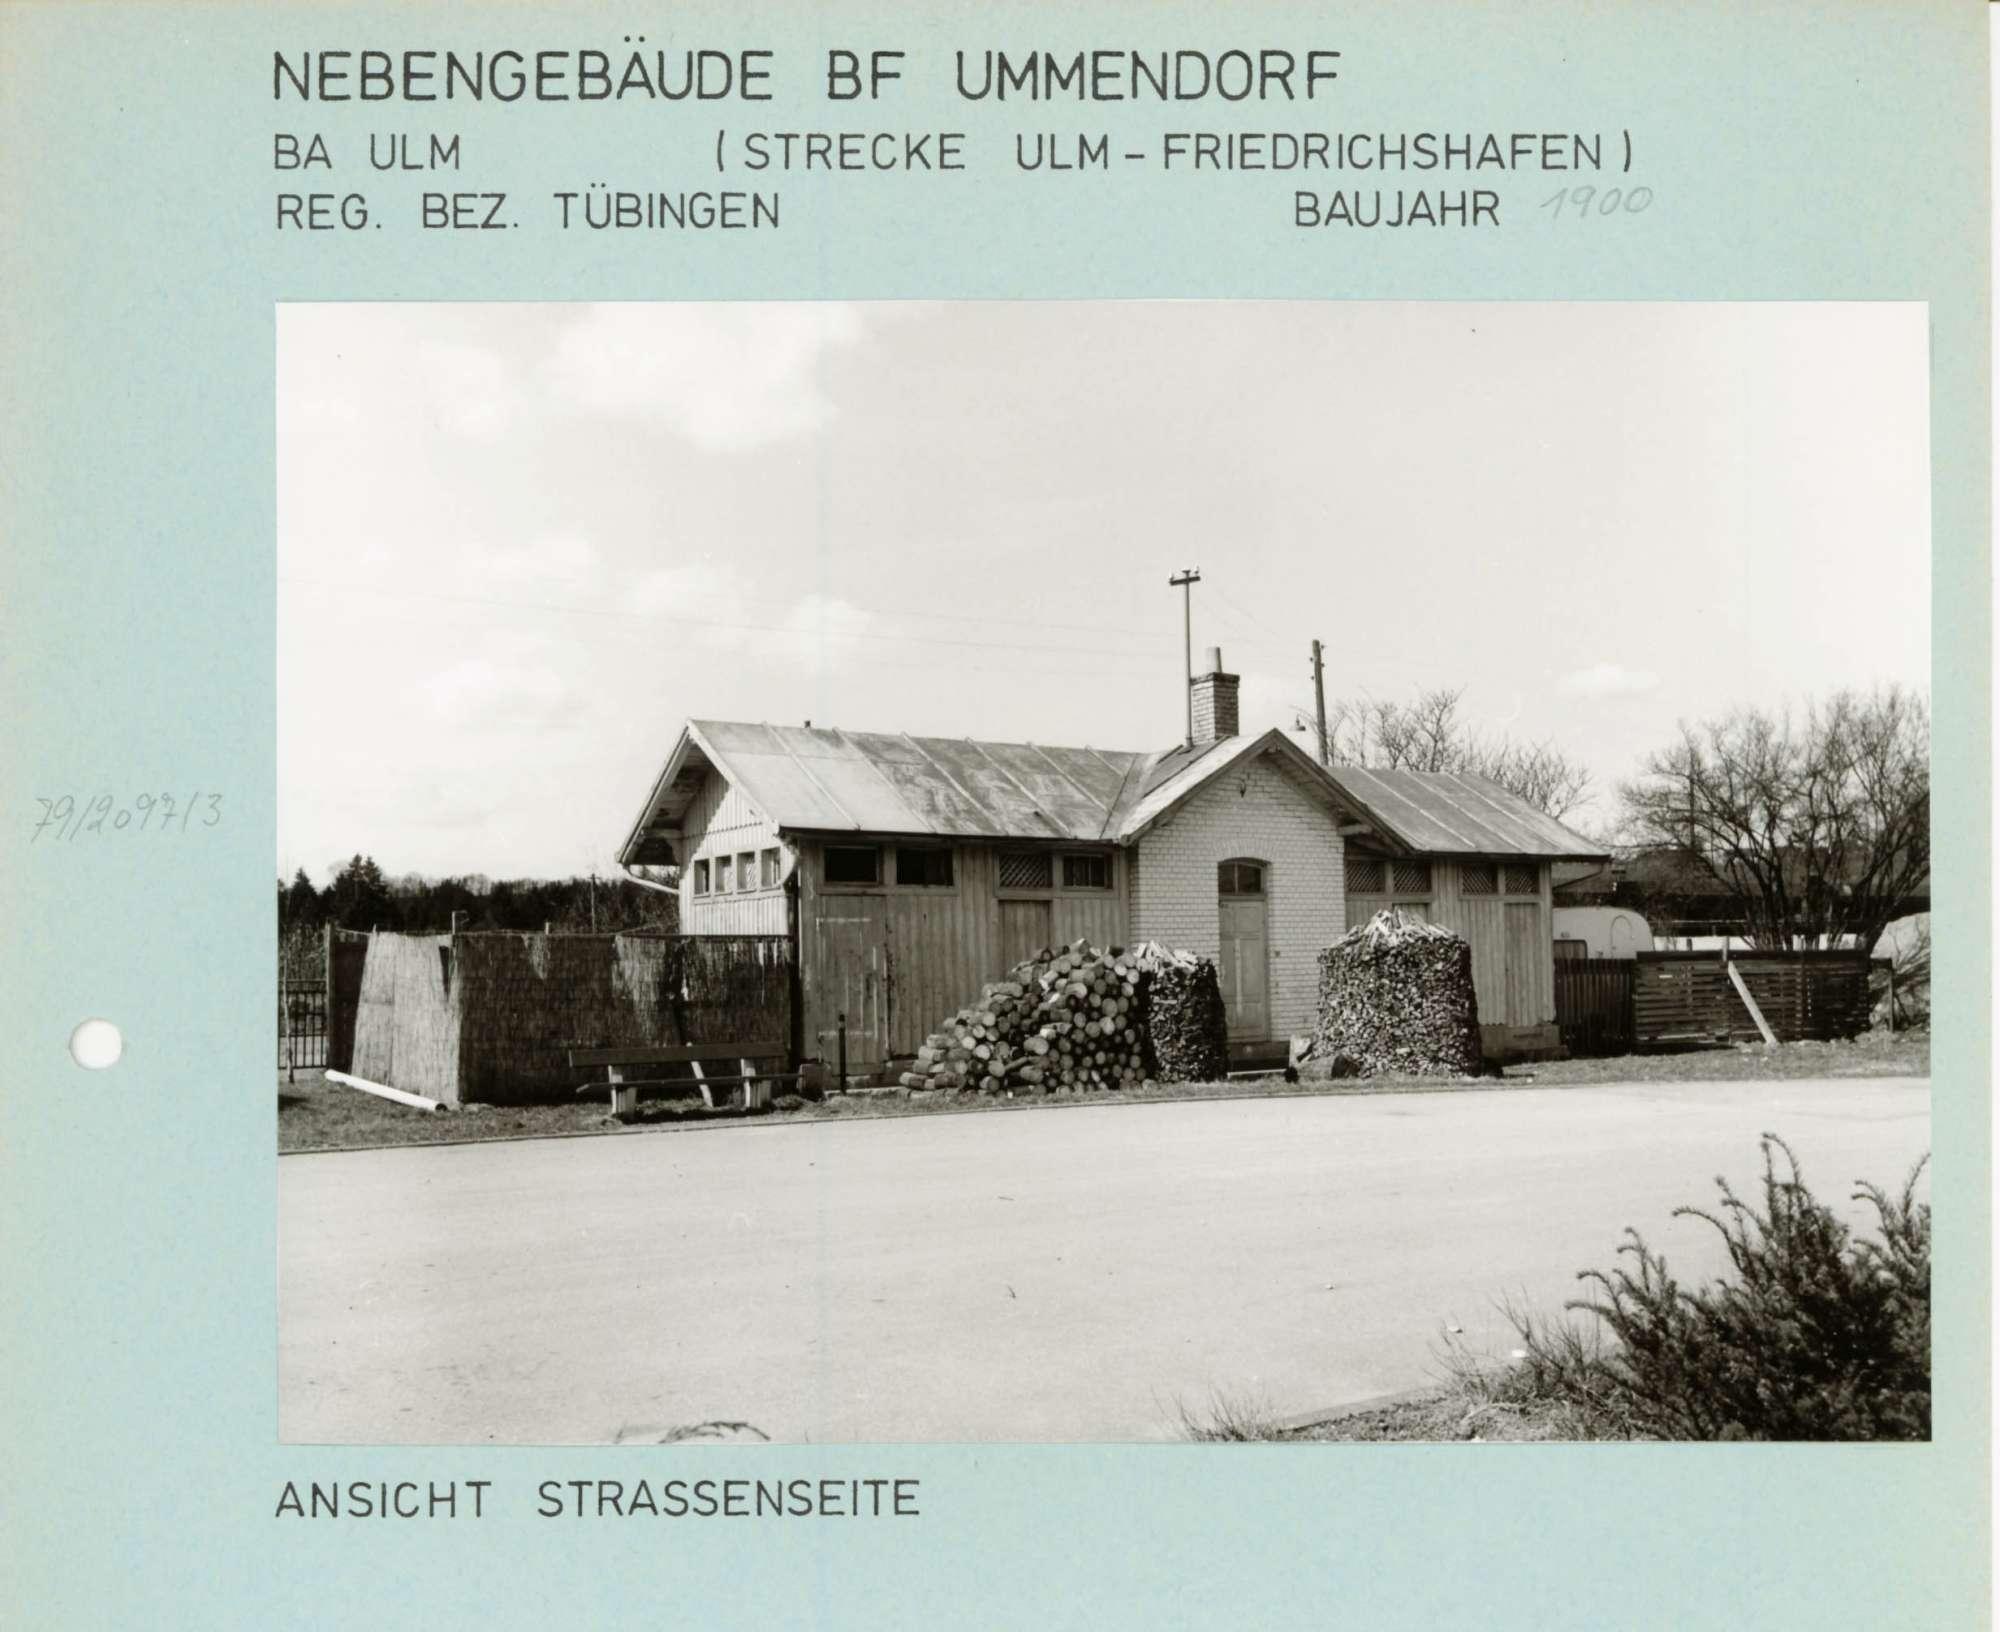 Ummendorf: 6 Fotos, Bild 1